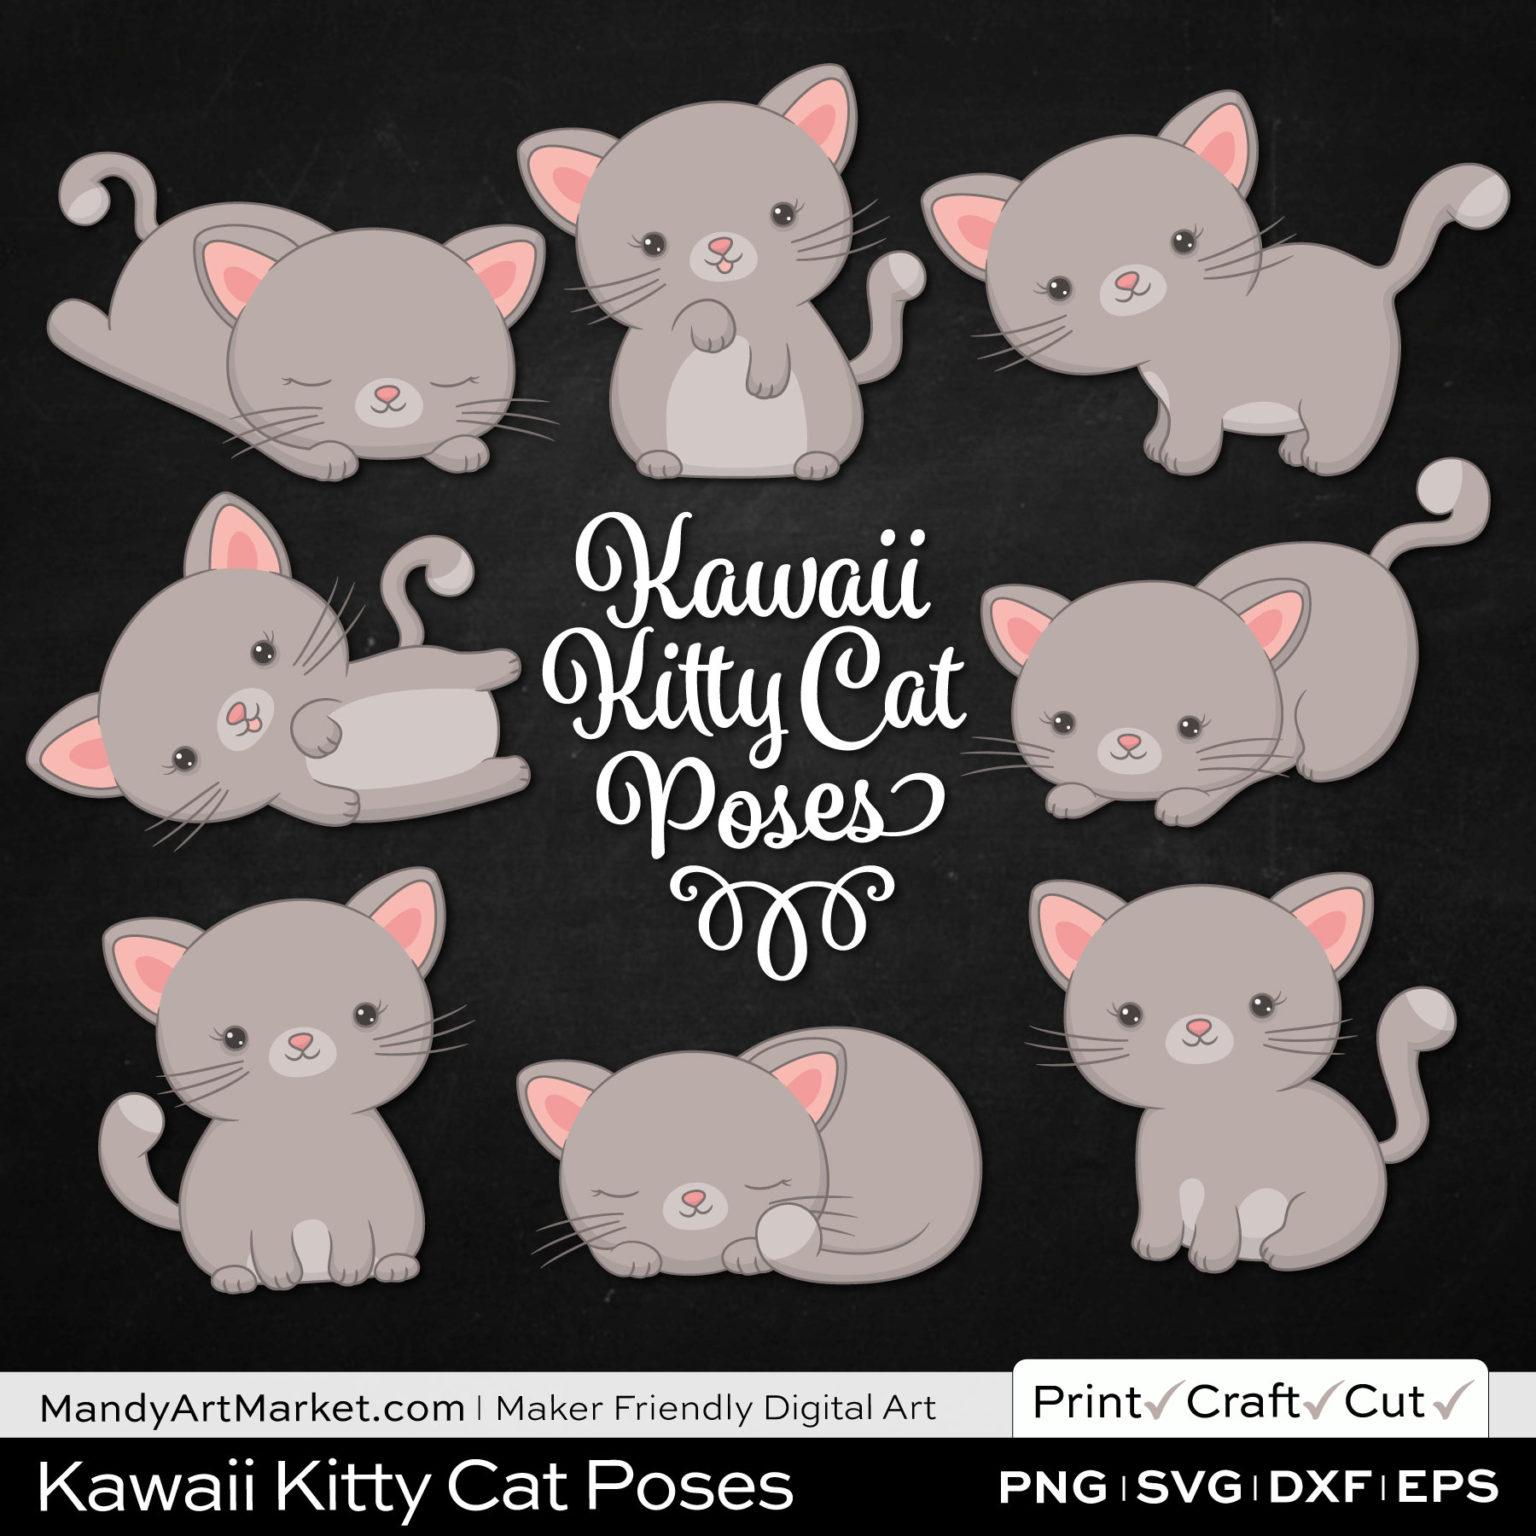 Light Fog Gray Kawaii Kitty Cat Poses Clipart on Black Background